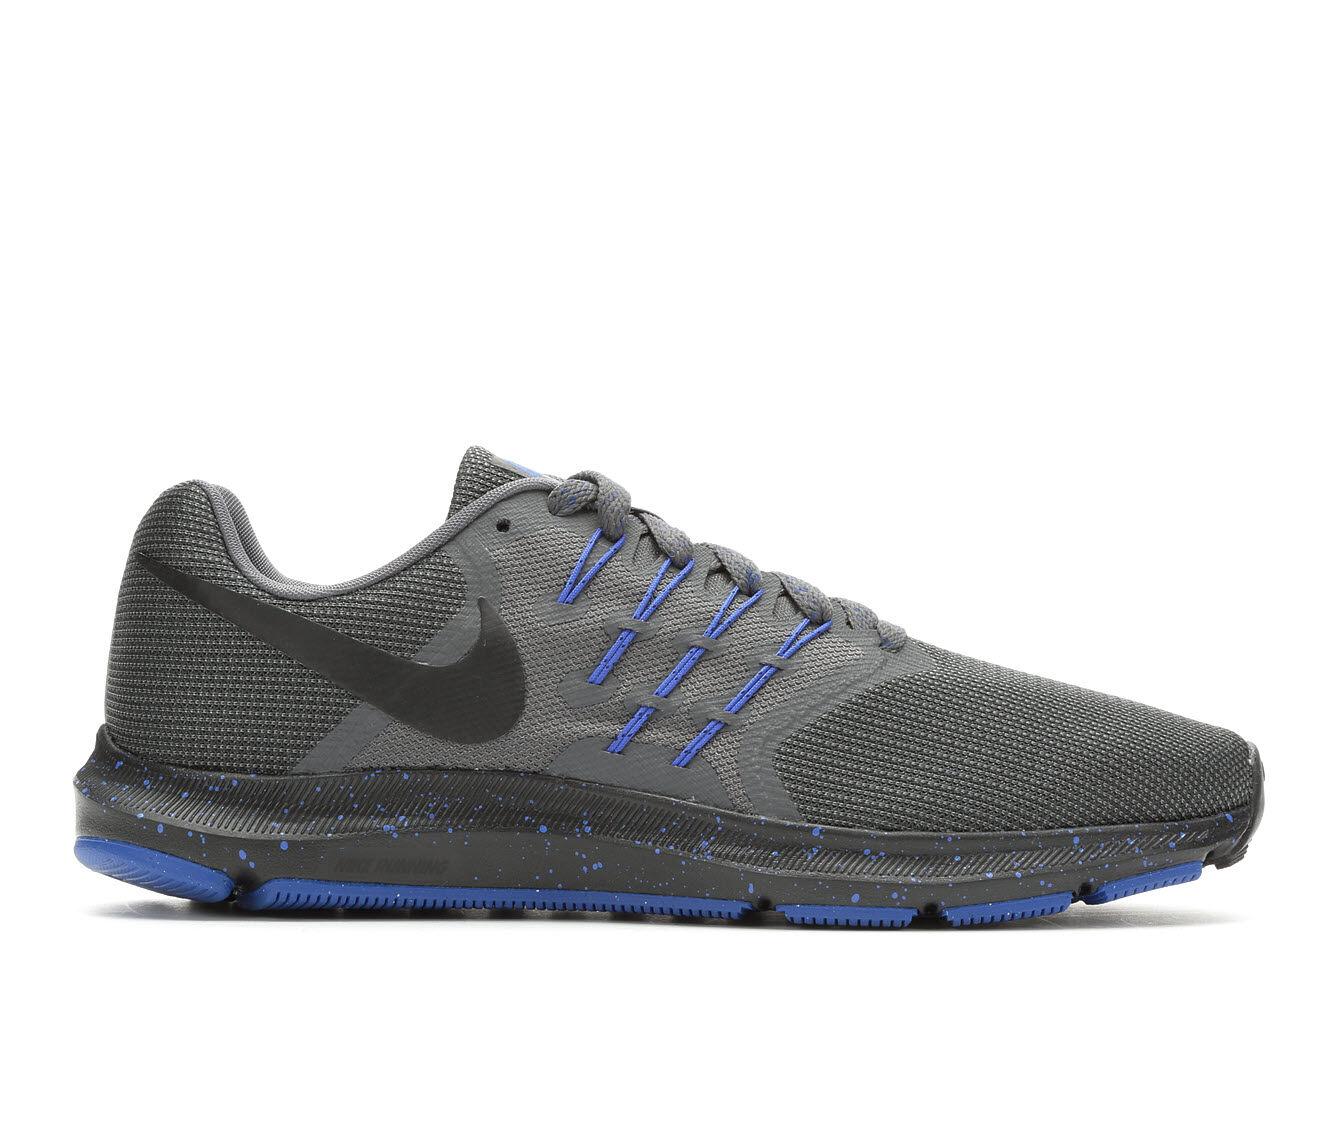 Men's Nike Swift SE Running Shoes Gry/Blk/Blu